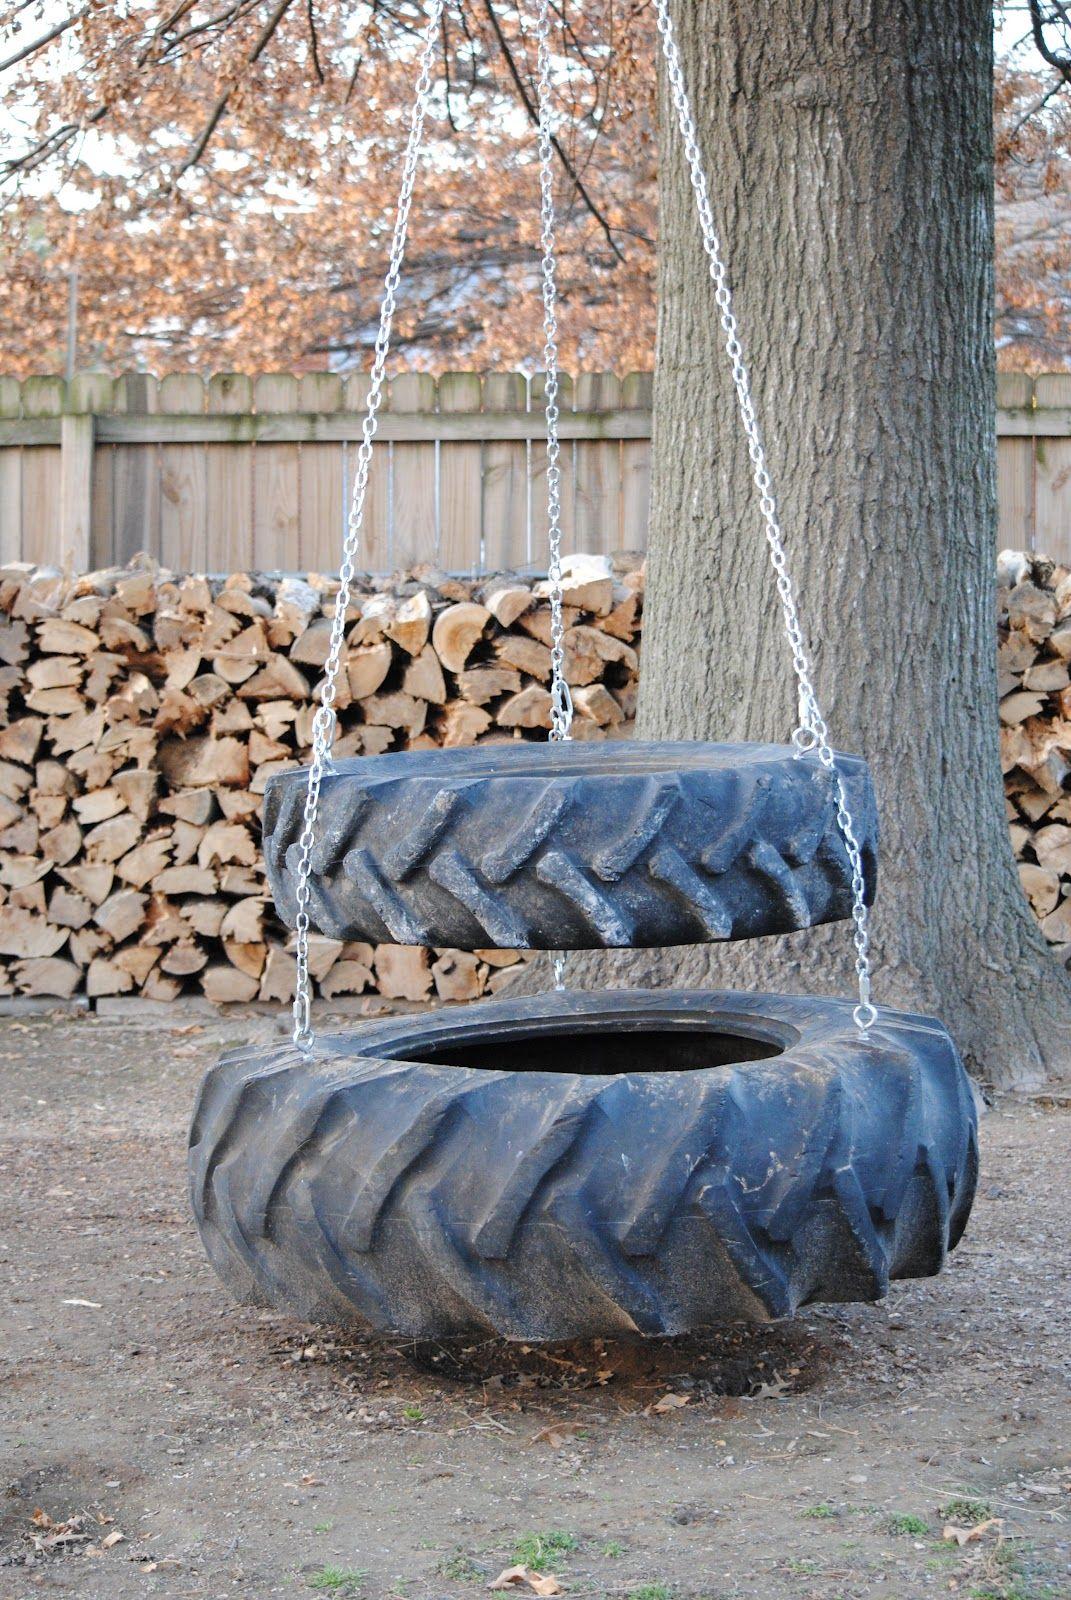 26 Playful Tire Swings That You Can Build Yourself Traktorreifen Spielplatz Garten